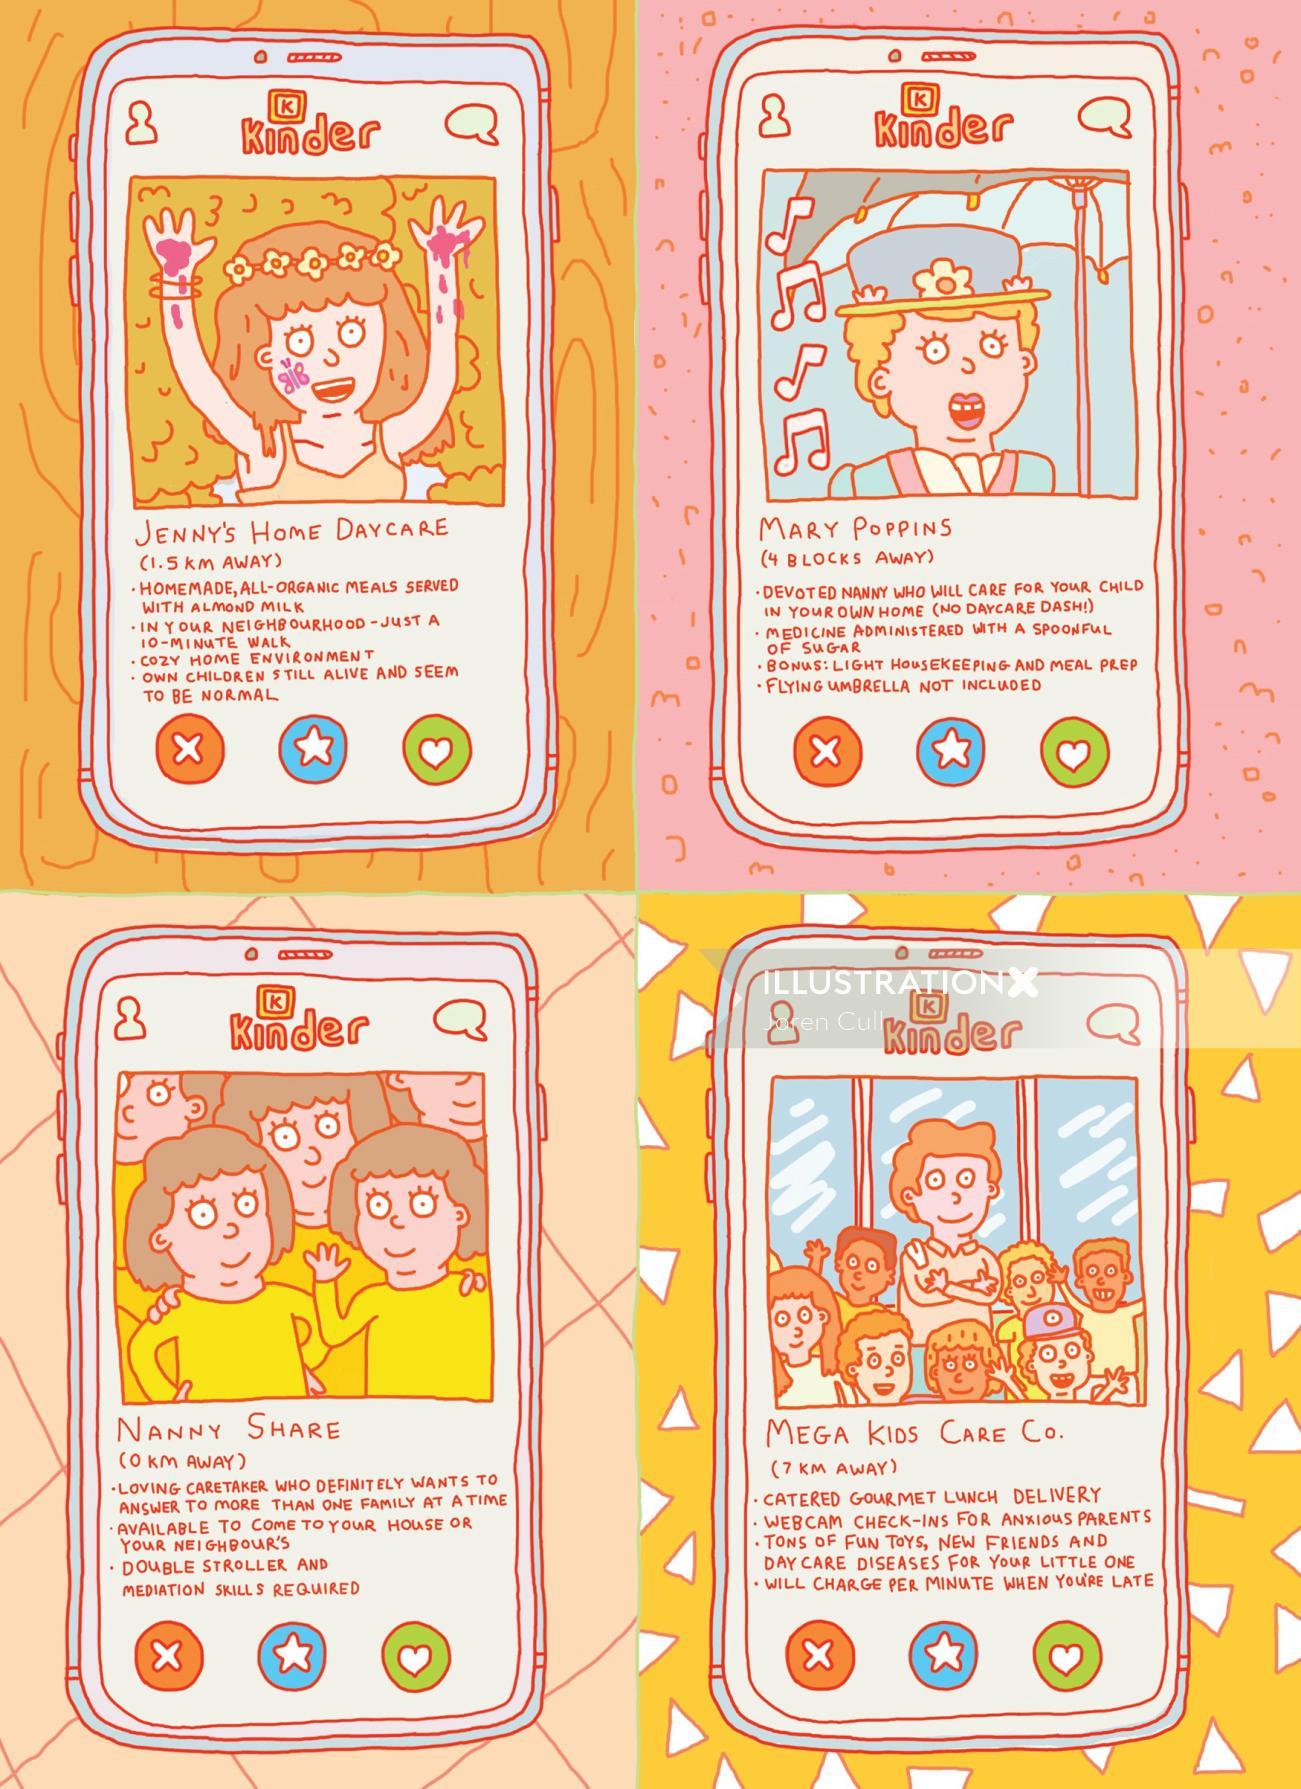 Illustration of child care